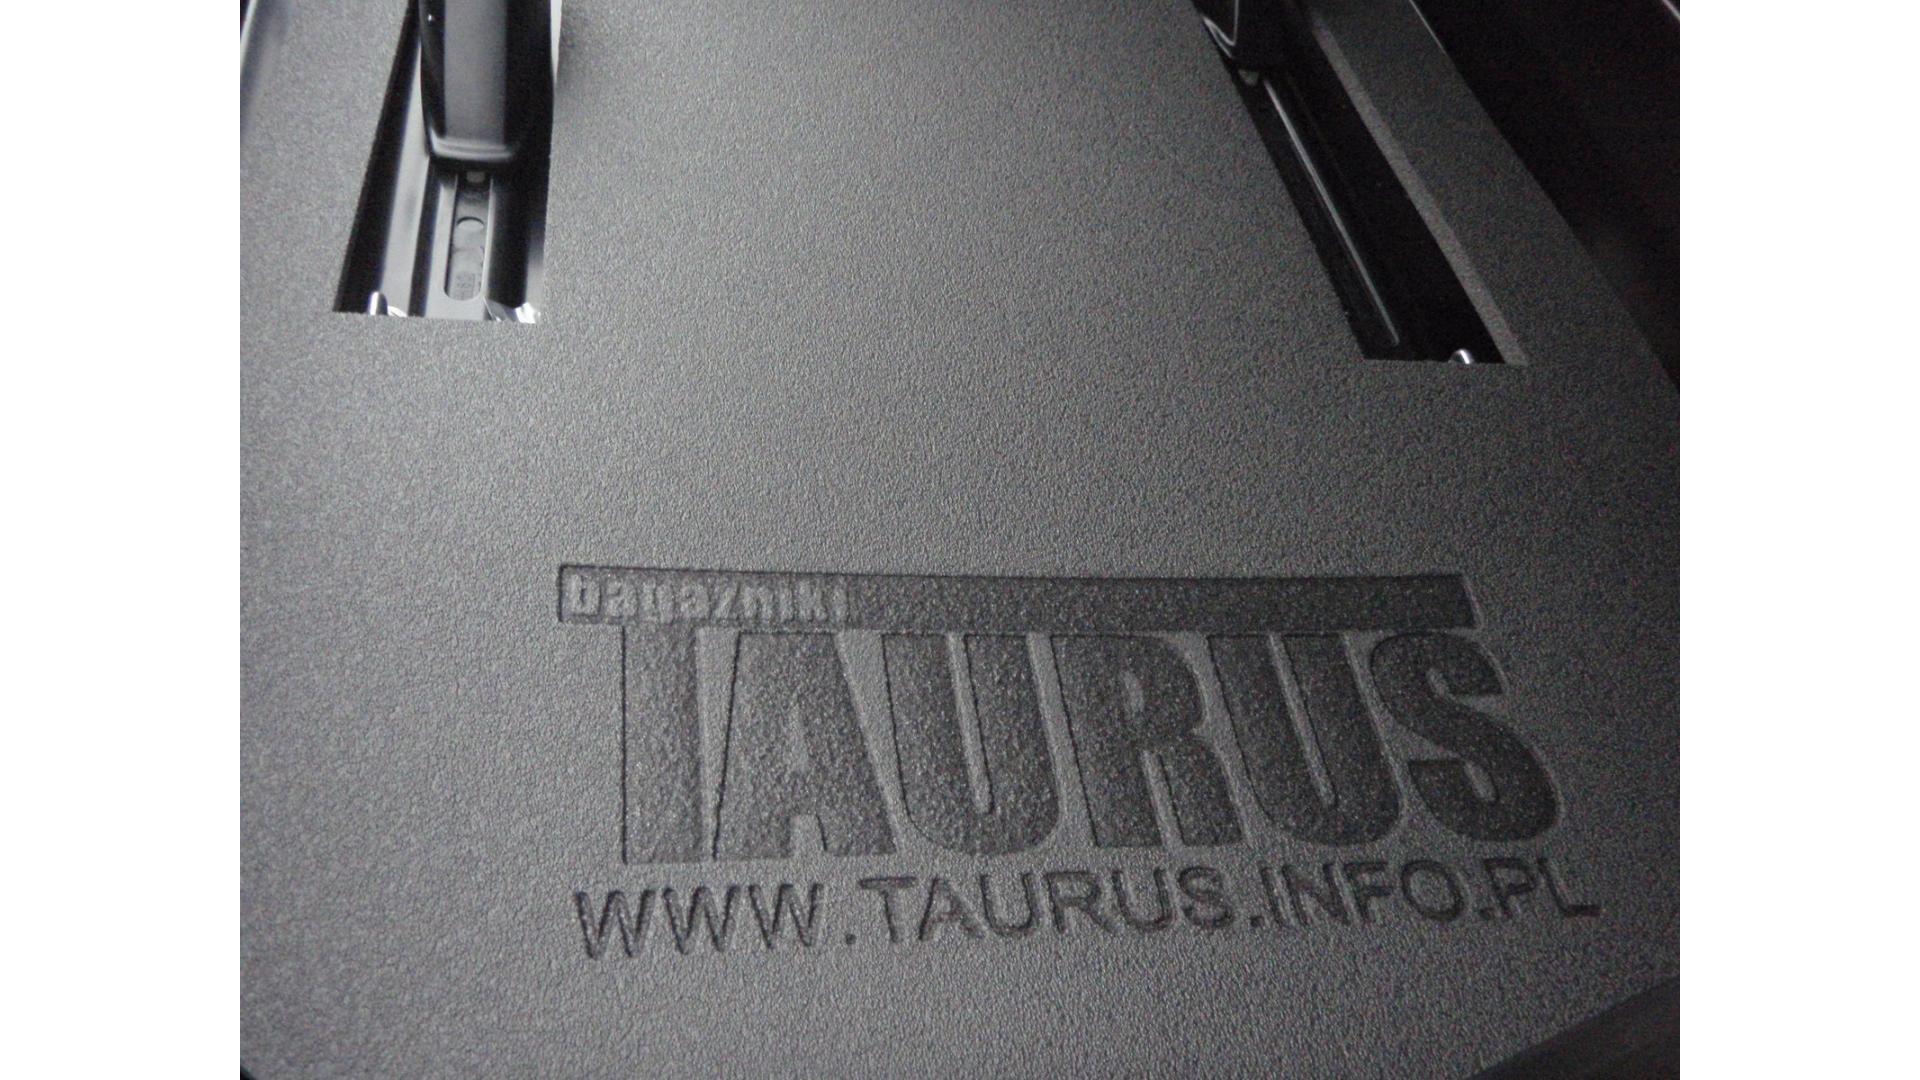 Taurus ochranní vložka do boxu A 600 (170x55 cm) ST